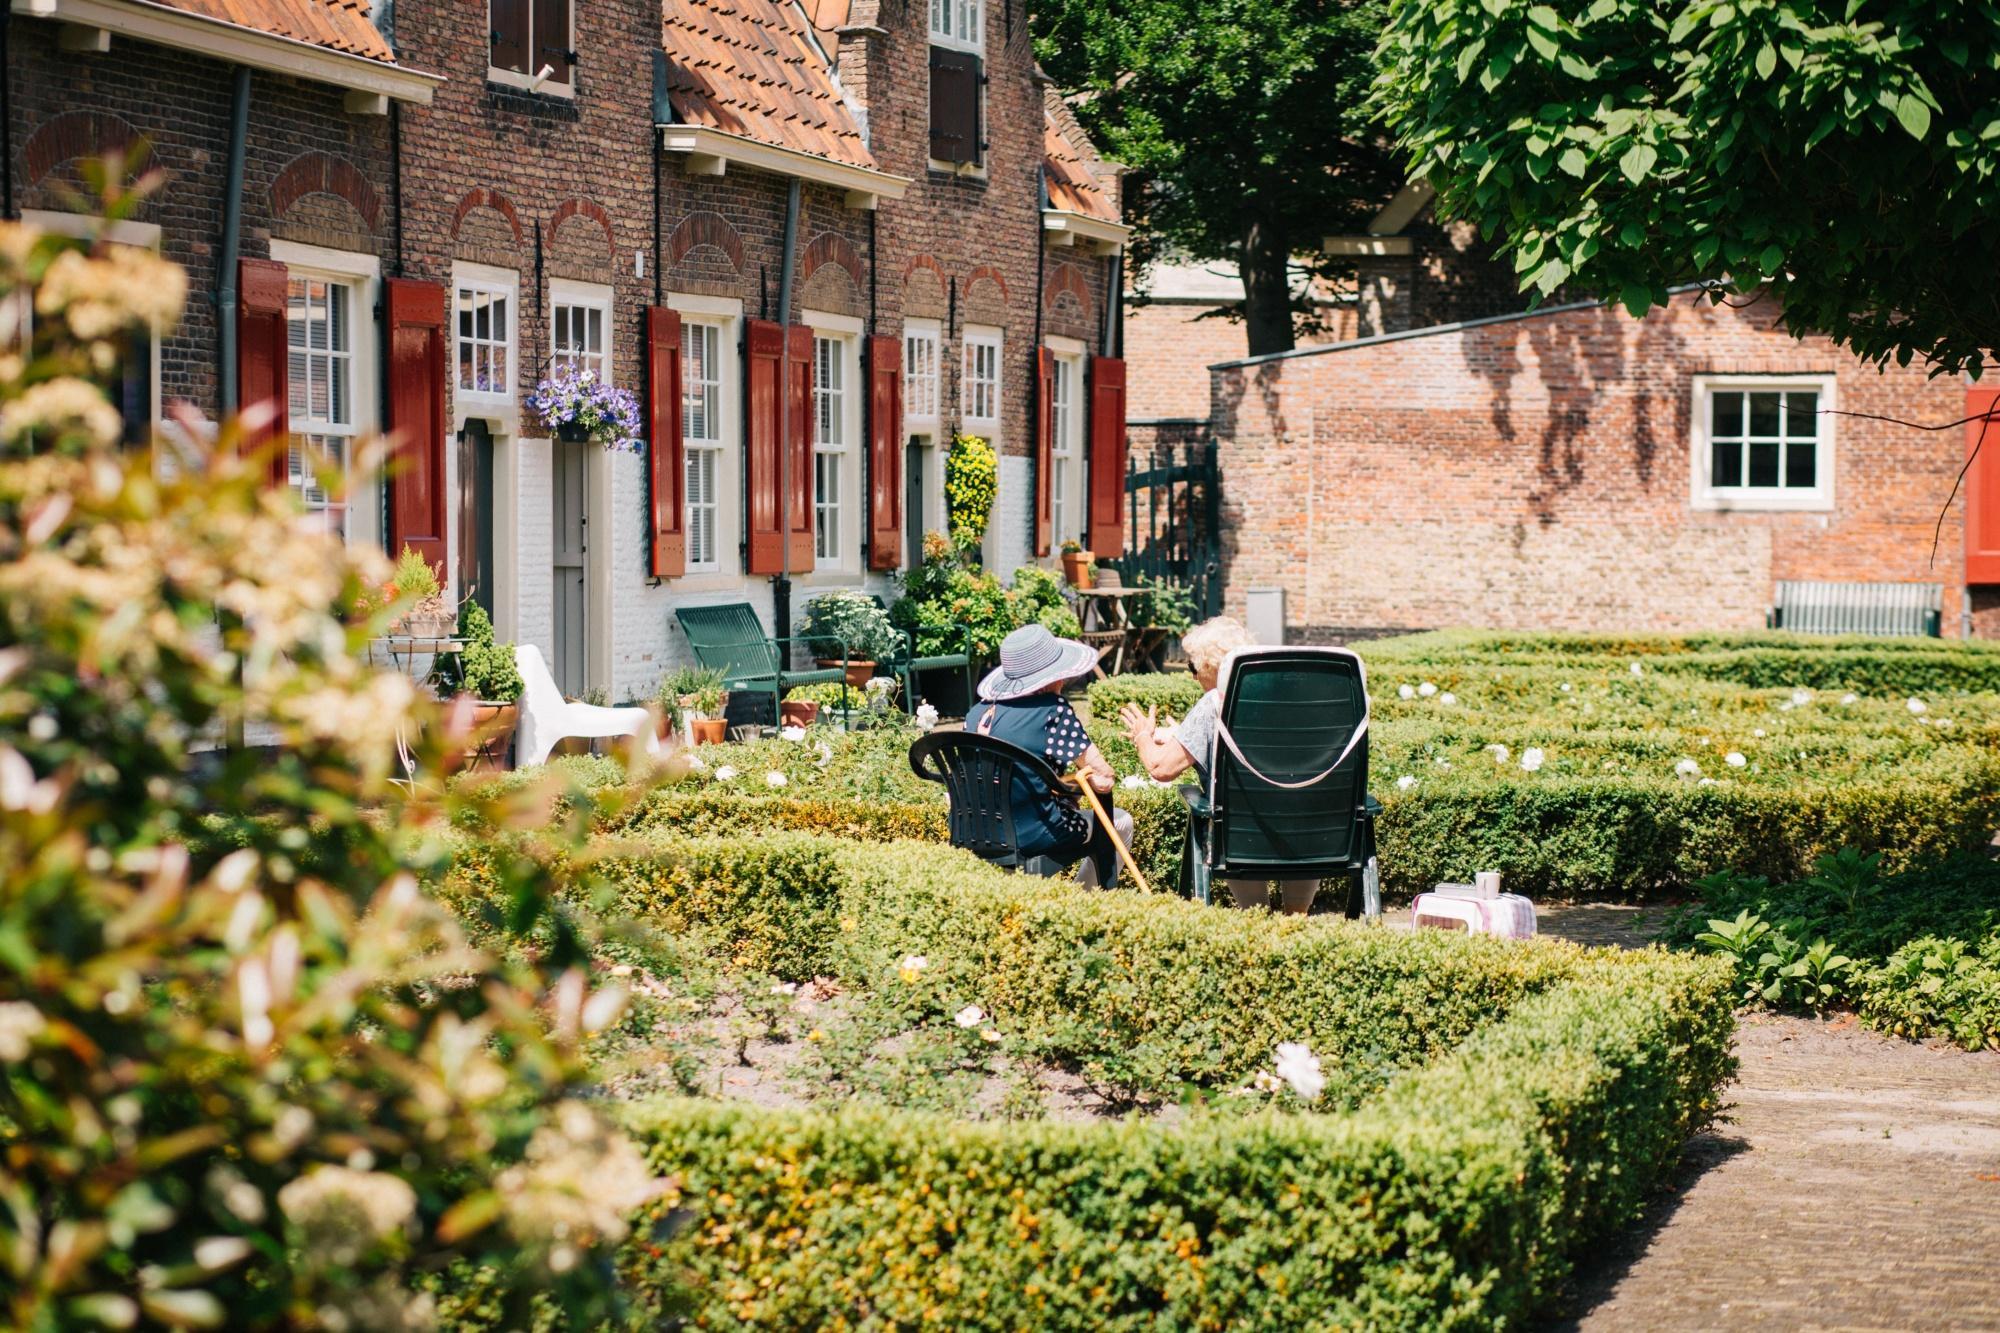 Social aspect of gardening - Gardening as therapy by Garden Escape